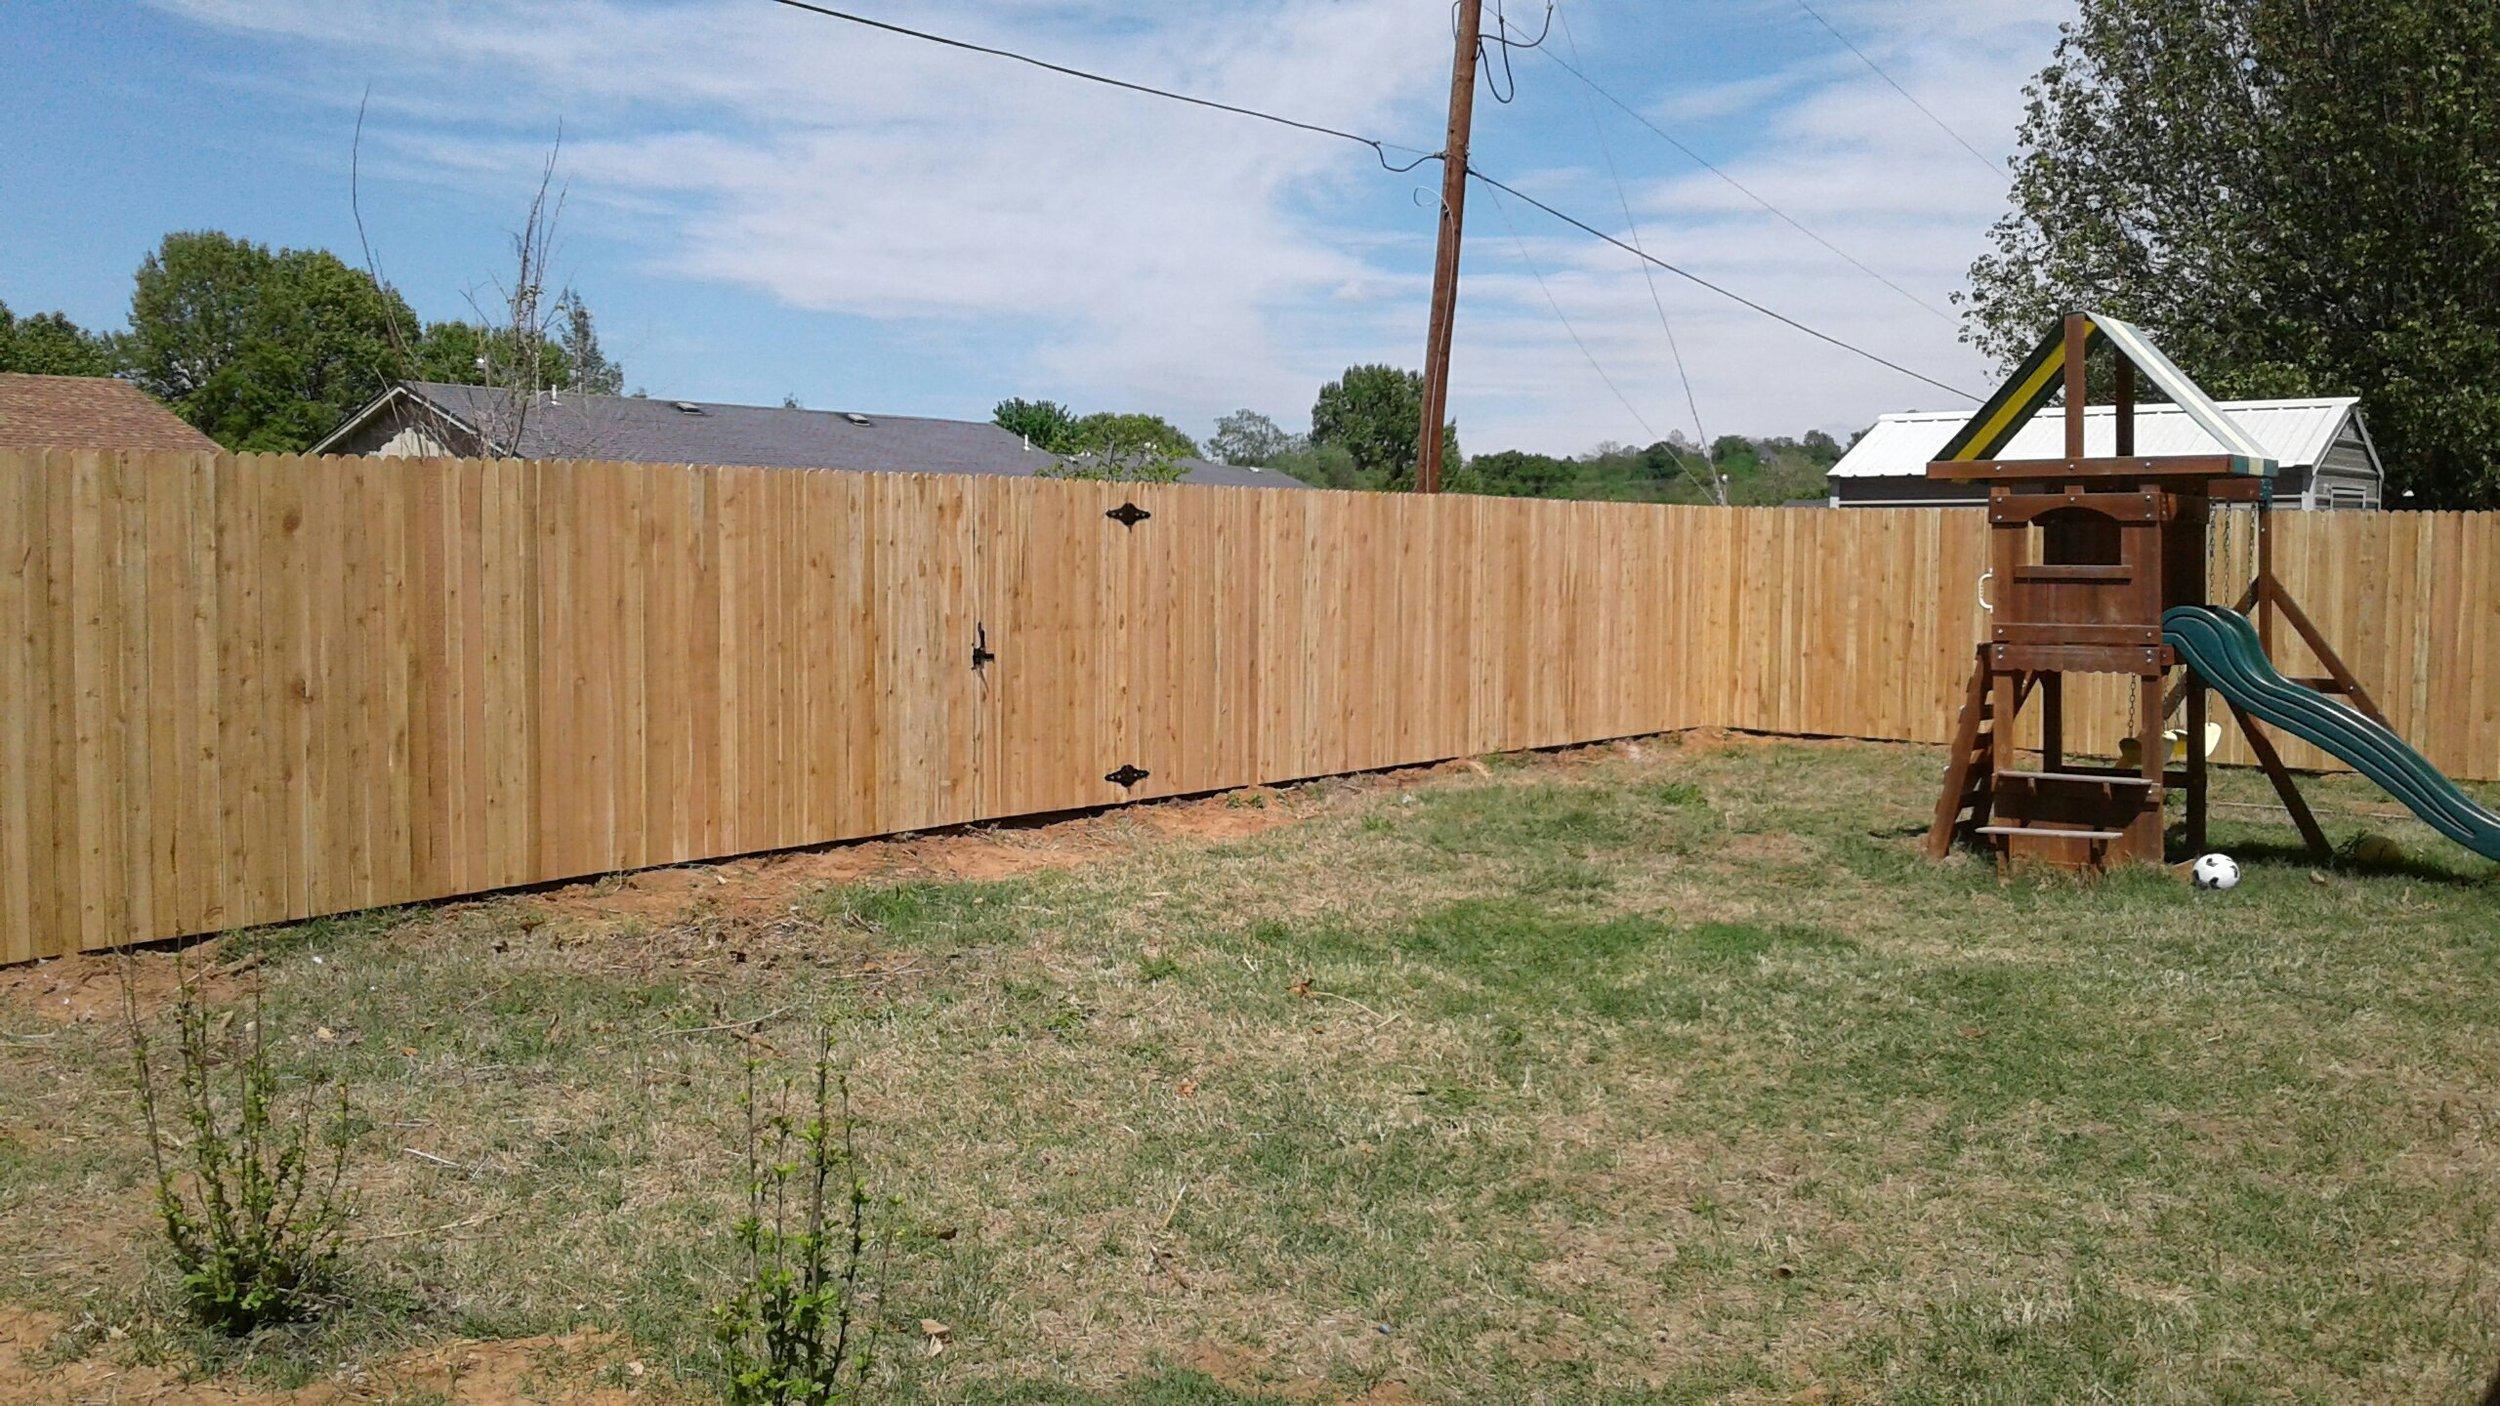 res wood fence-Resized_20180504_150914.jpg